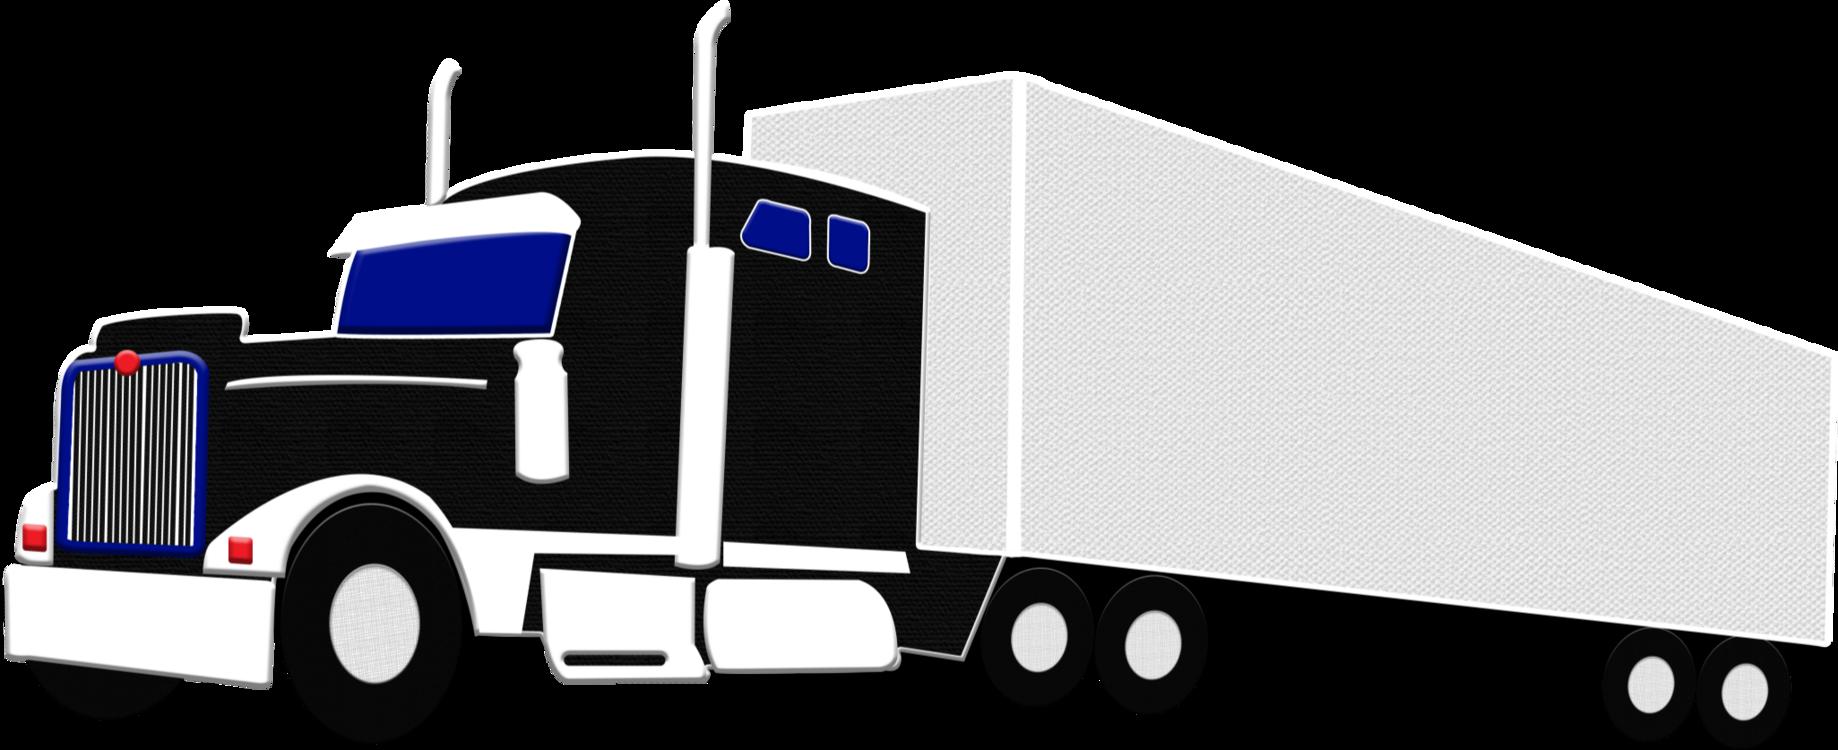 Car,Brand,Freight Transport